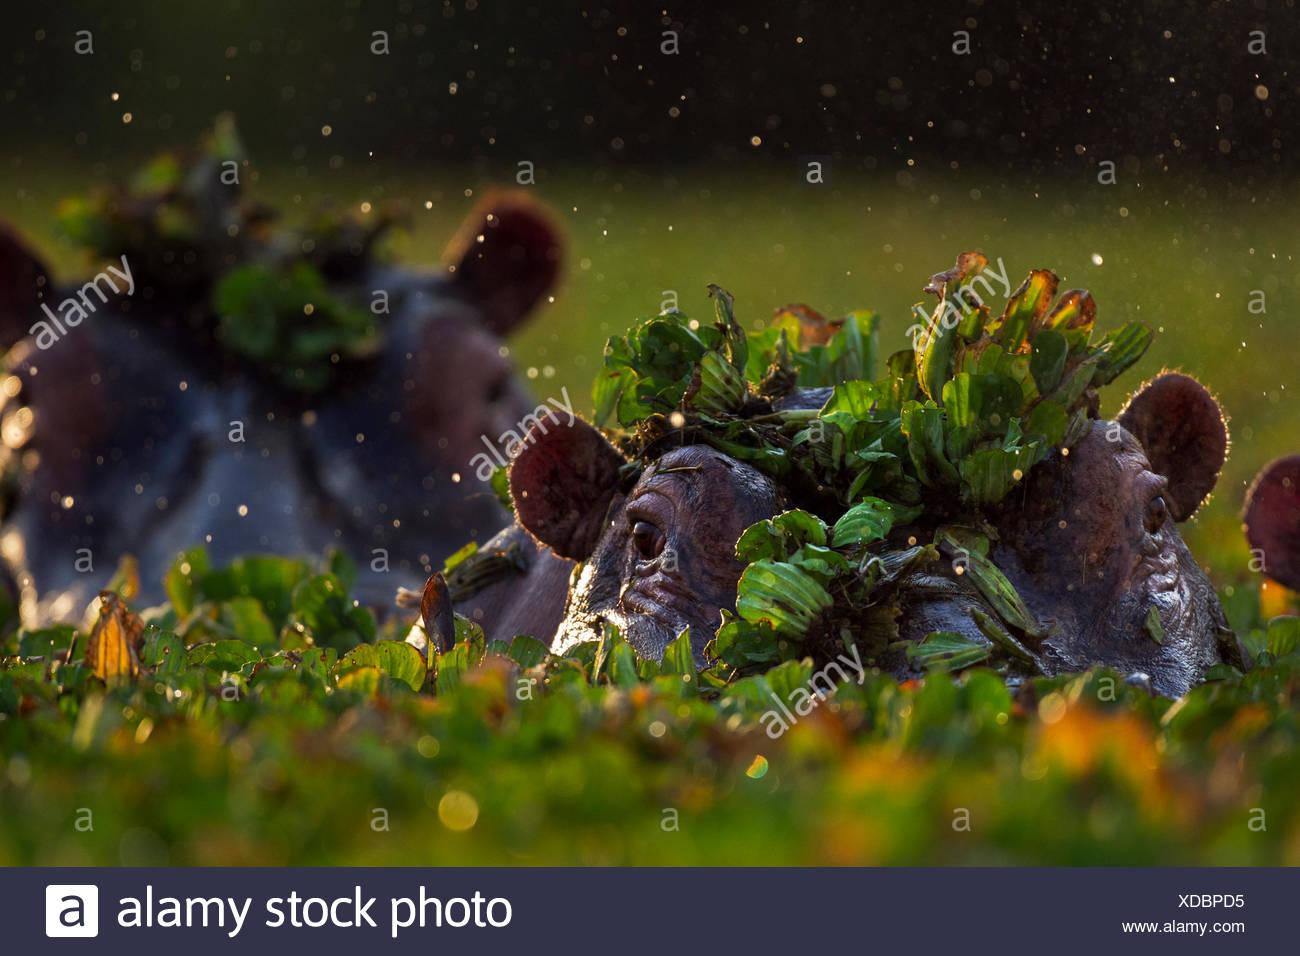 Hippopotamus (Hippopotamus amphibius) group submerged in water lettuce covered pool. Maasai Mara National Reserve, Kenya. Stock Photo